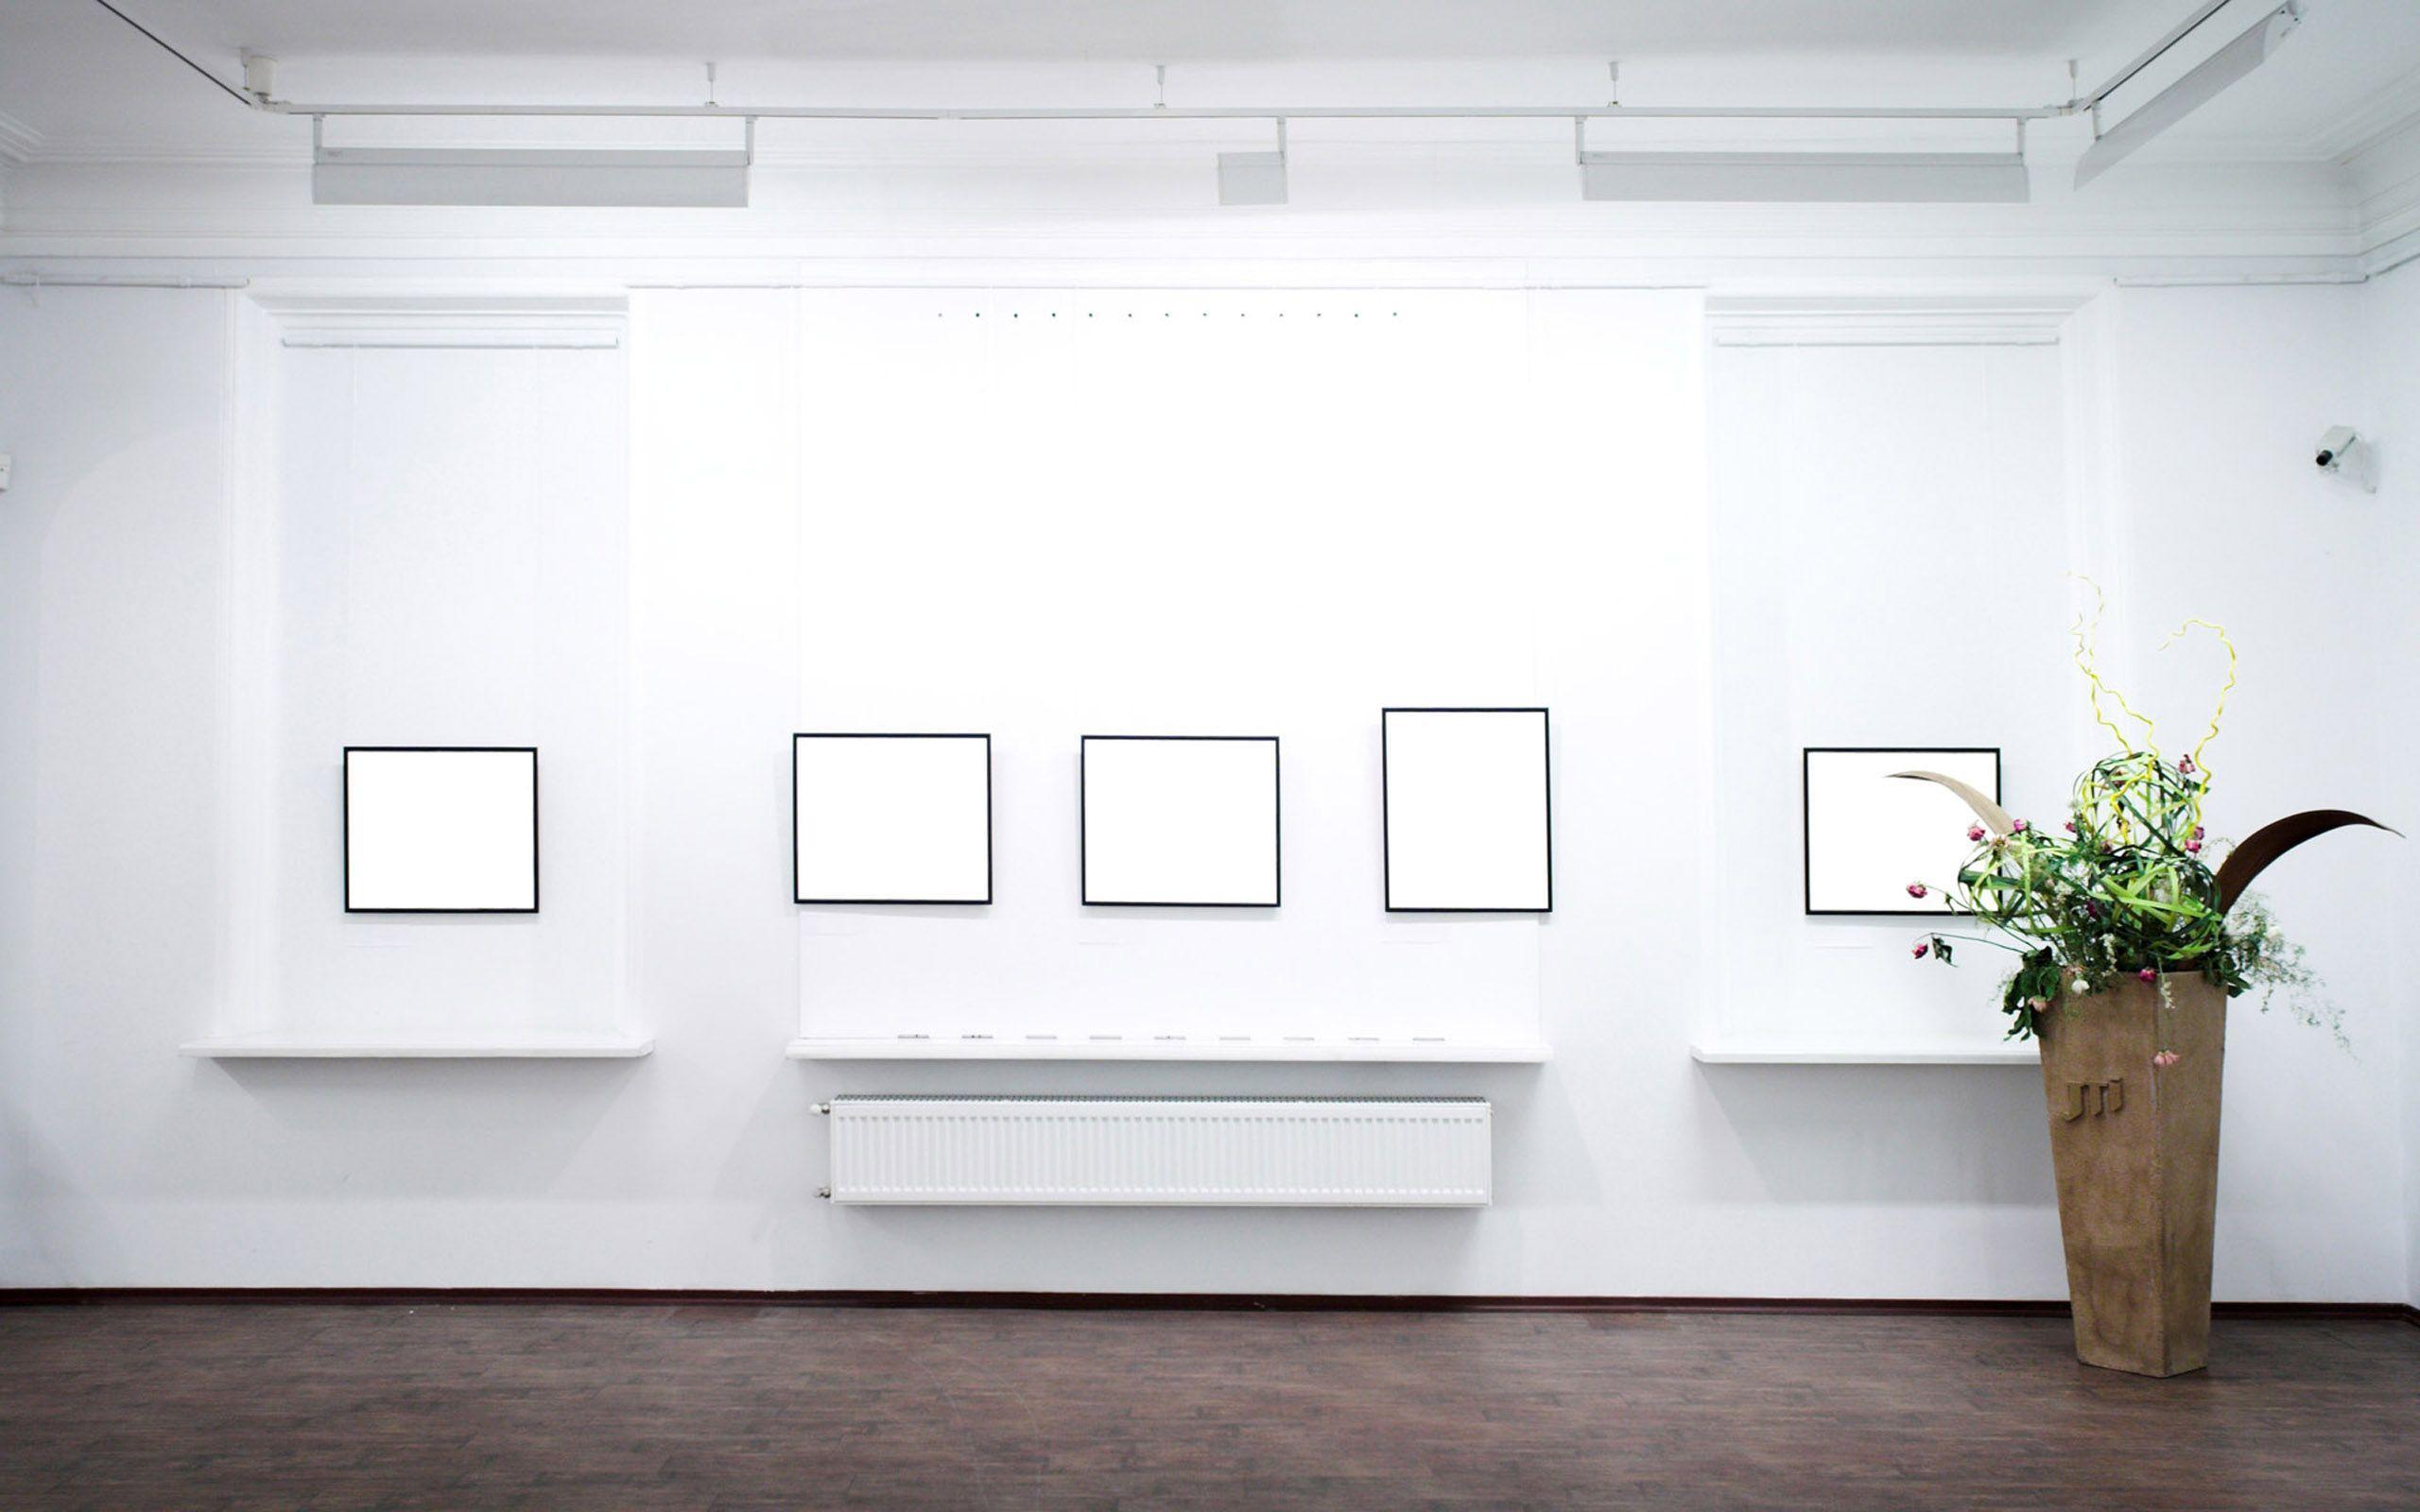 Shelf Desktop Wallpapers - Top Free Shelf Desktop ...